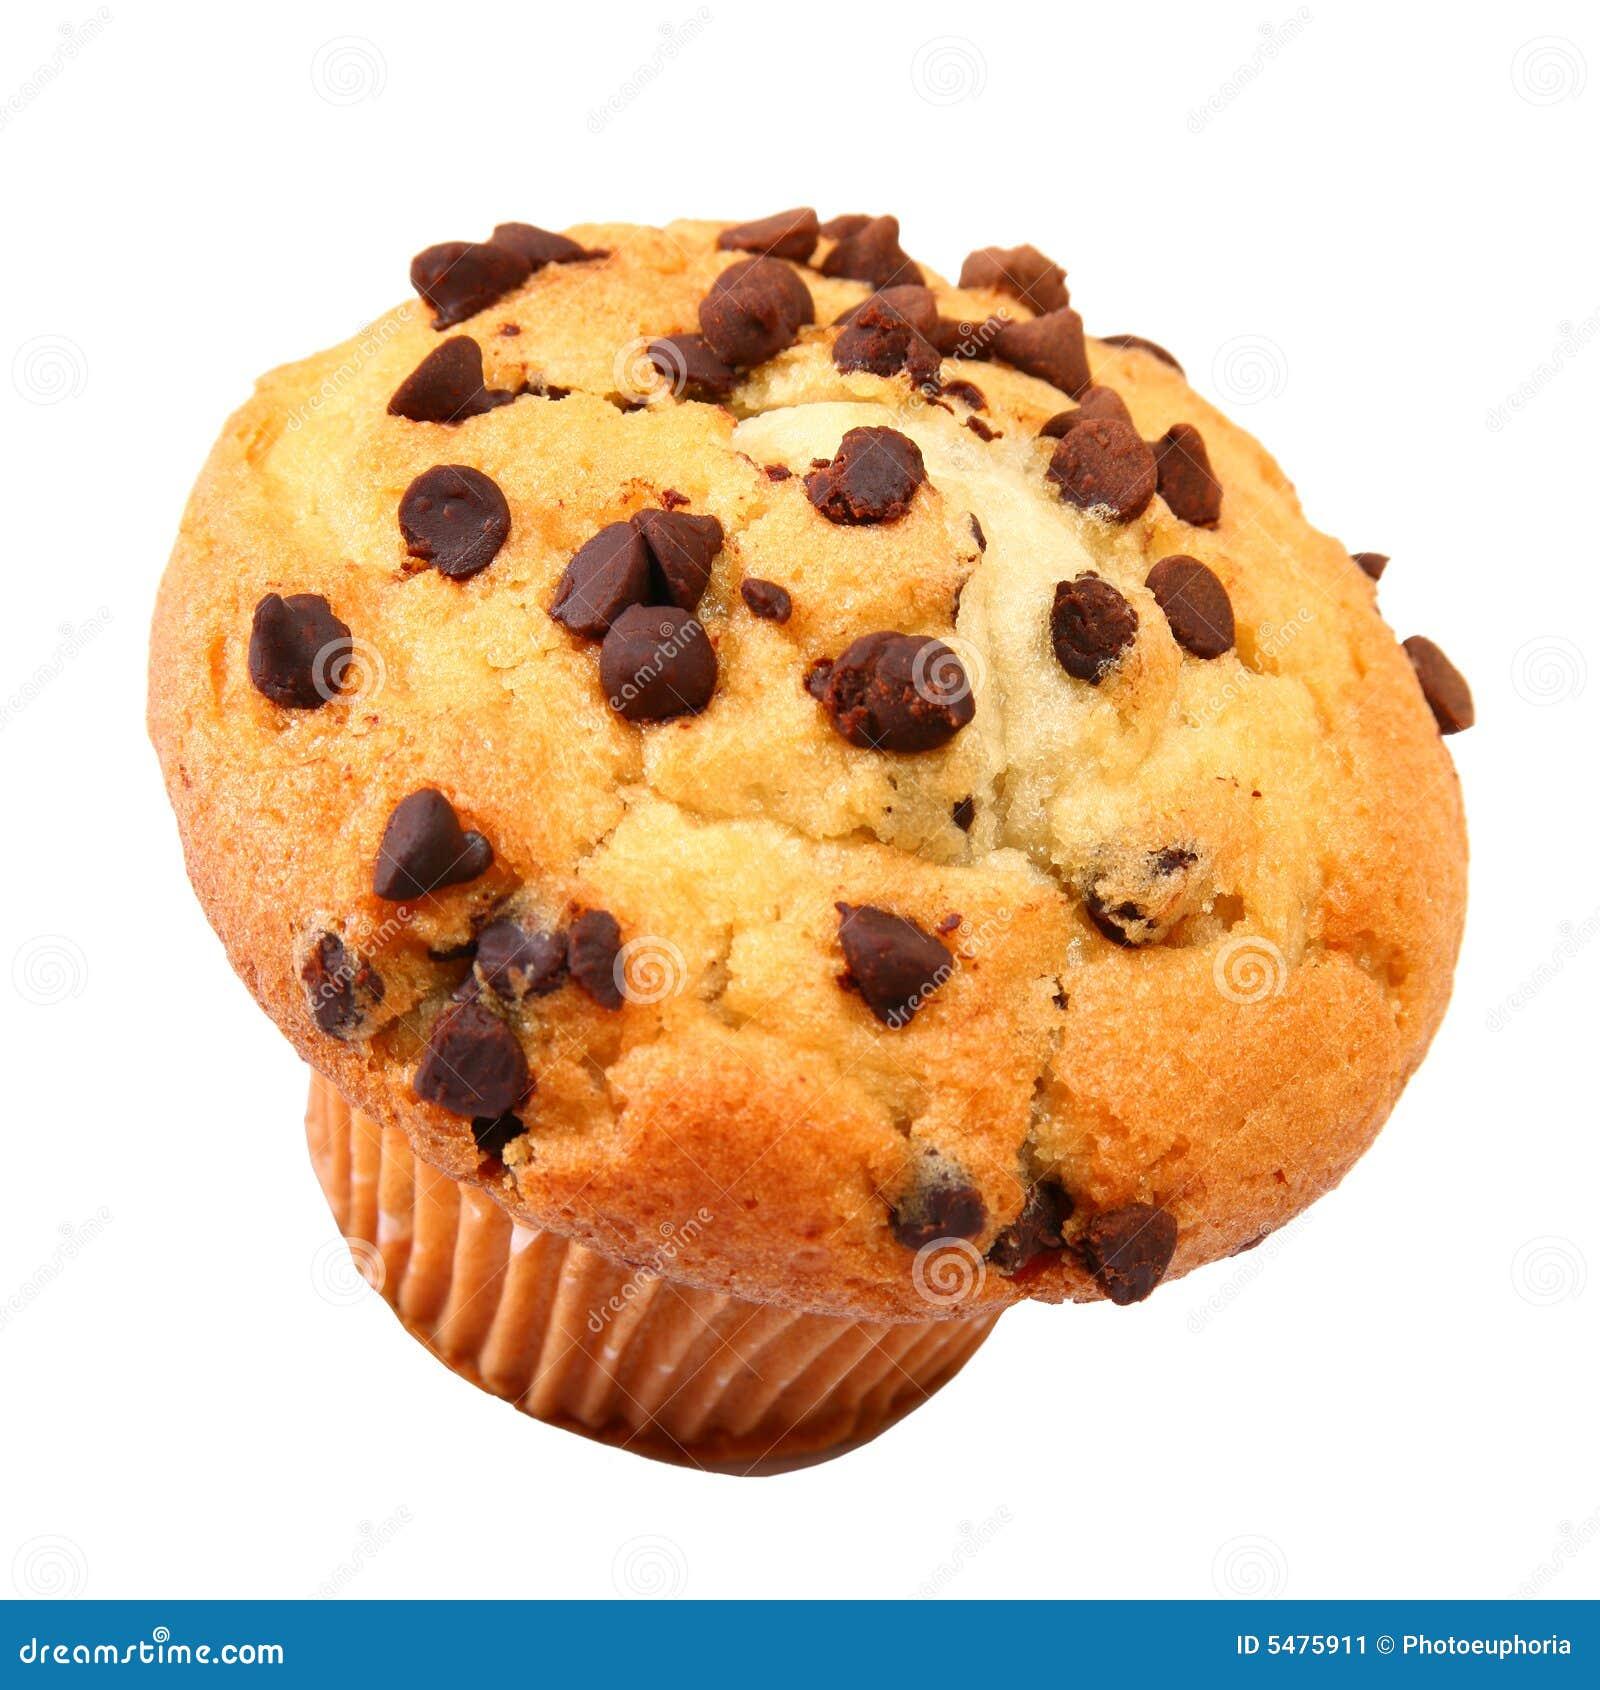 Chocolate Chip Muffin Stock Image Image Of Dessert Chocolate 5475911